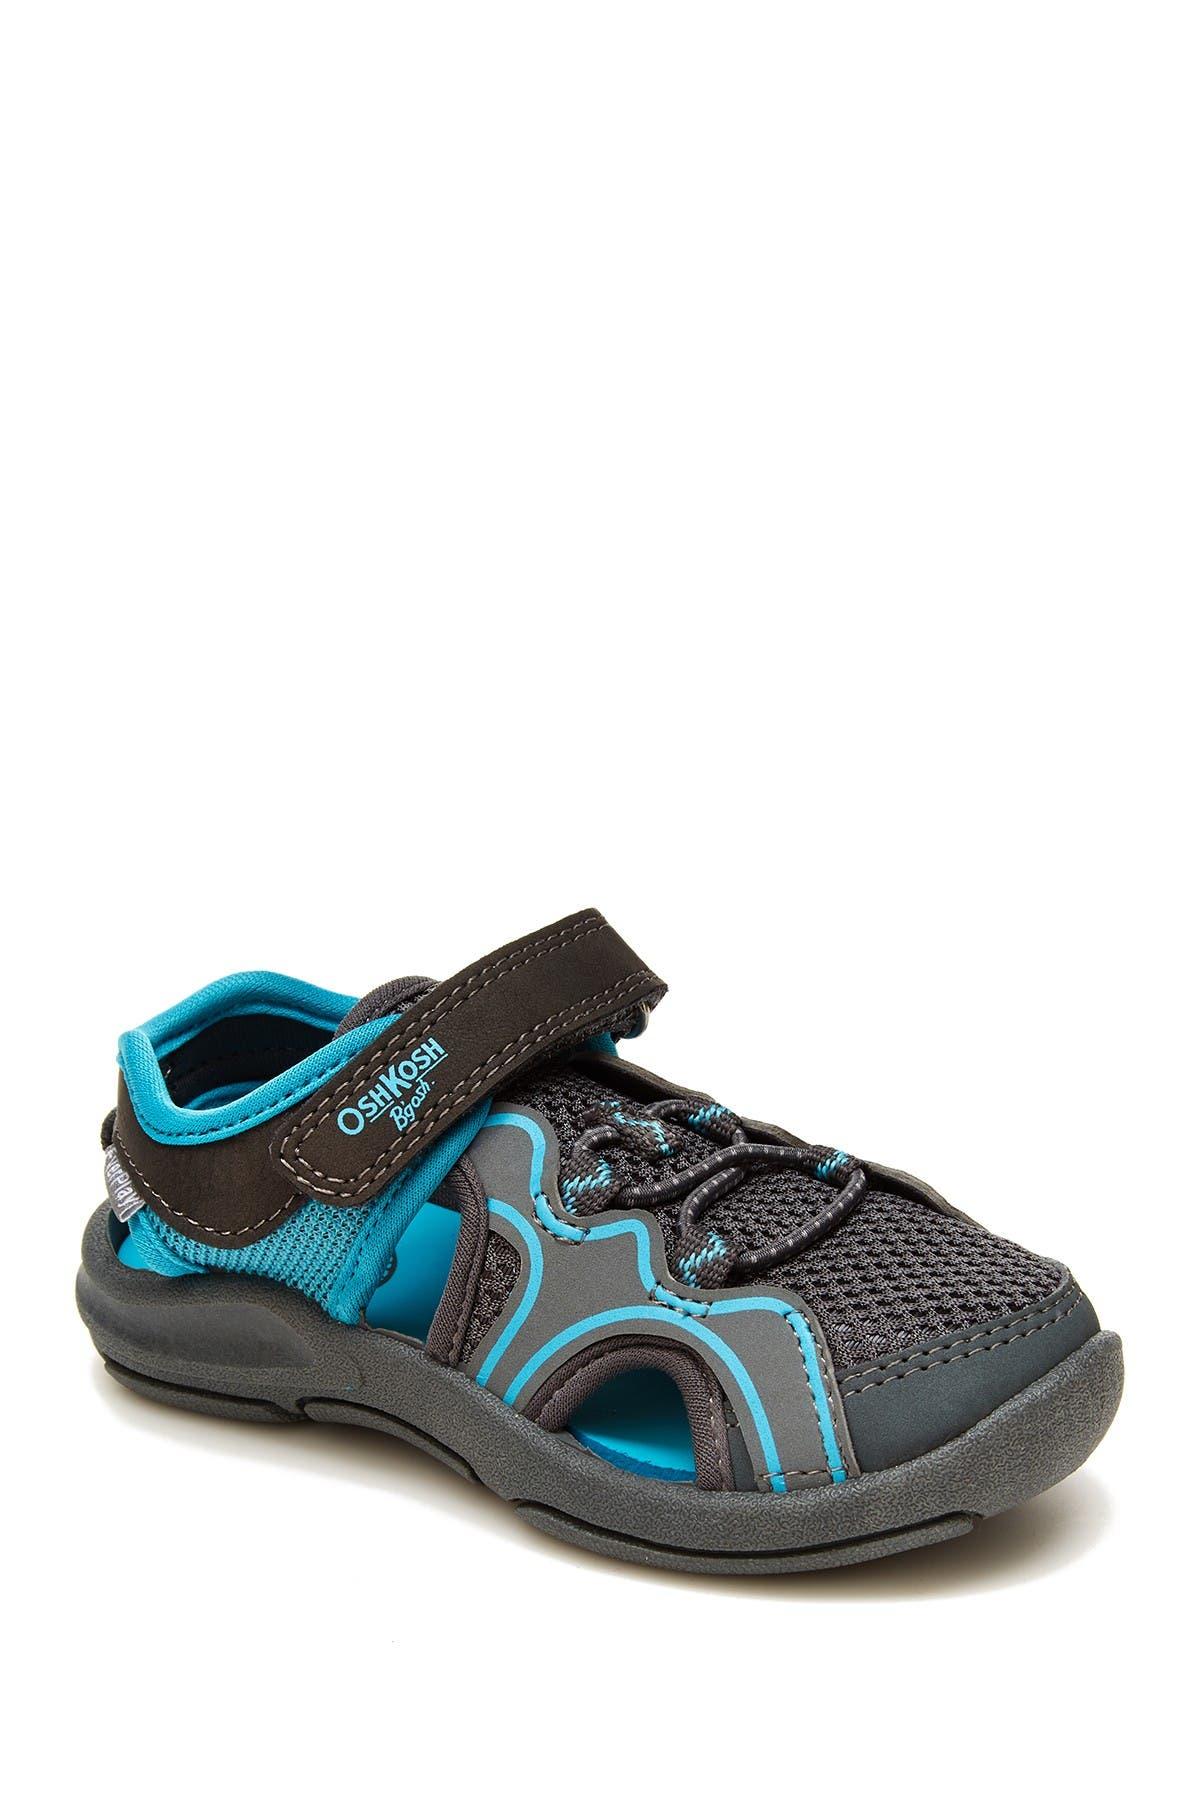 Image of OshKosh Tempu Water Sandal